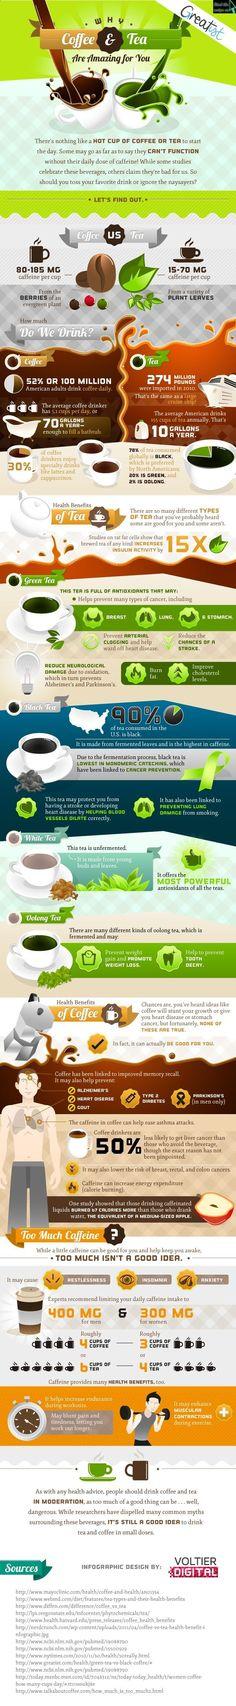 Coffee/Tea Facts